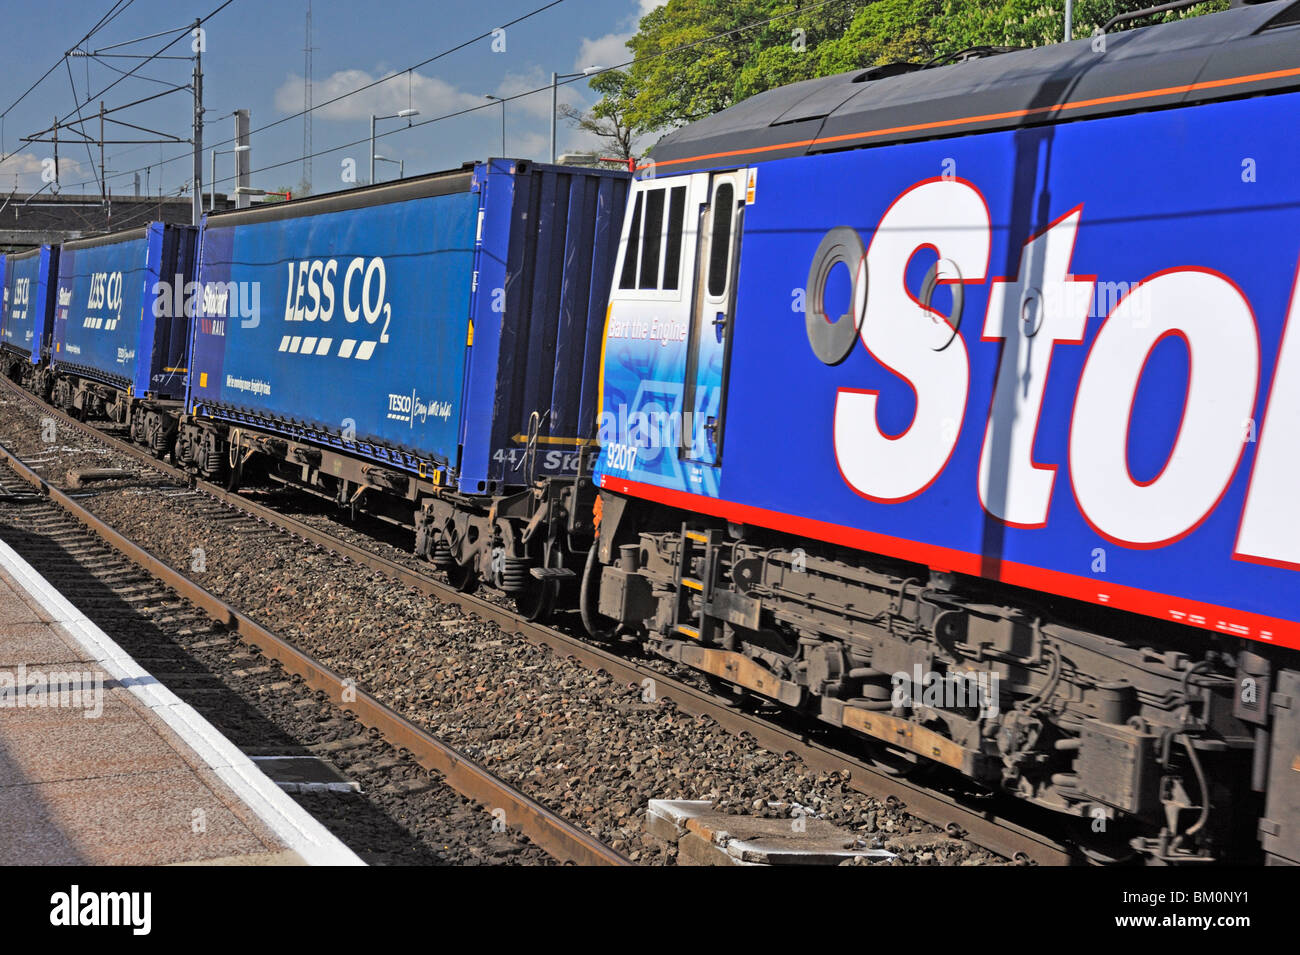 Stobart Rail locomotive No. 92017 'Bart the Engine' hauling Tesco Less CO2 freight. West Coast Main Line. - Stock Image